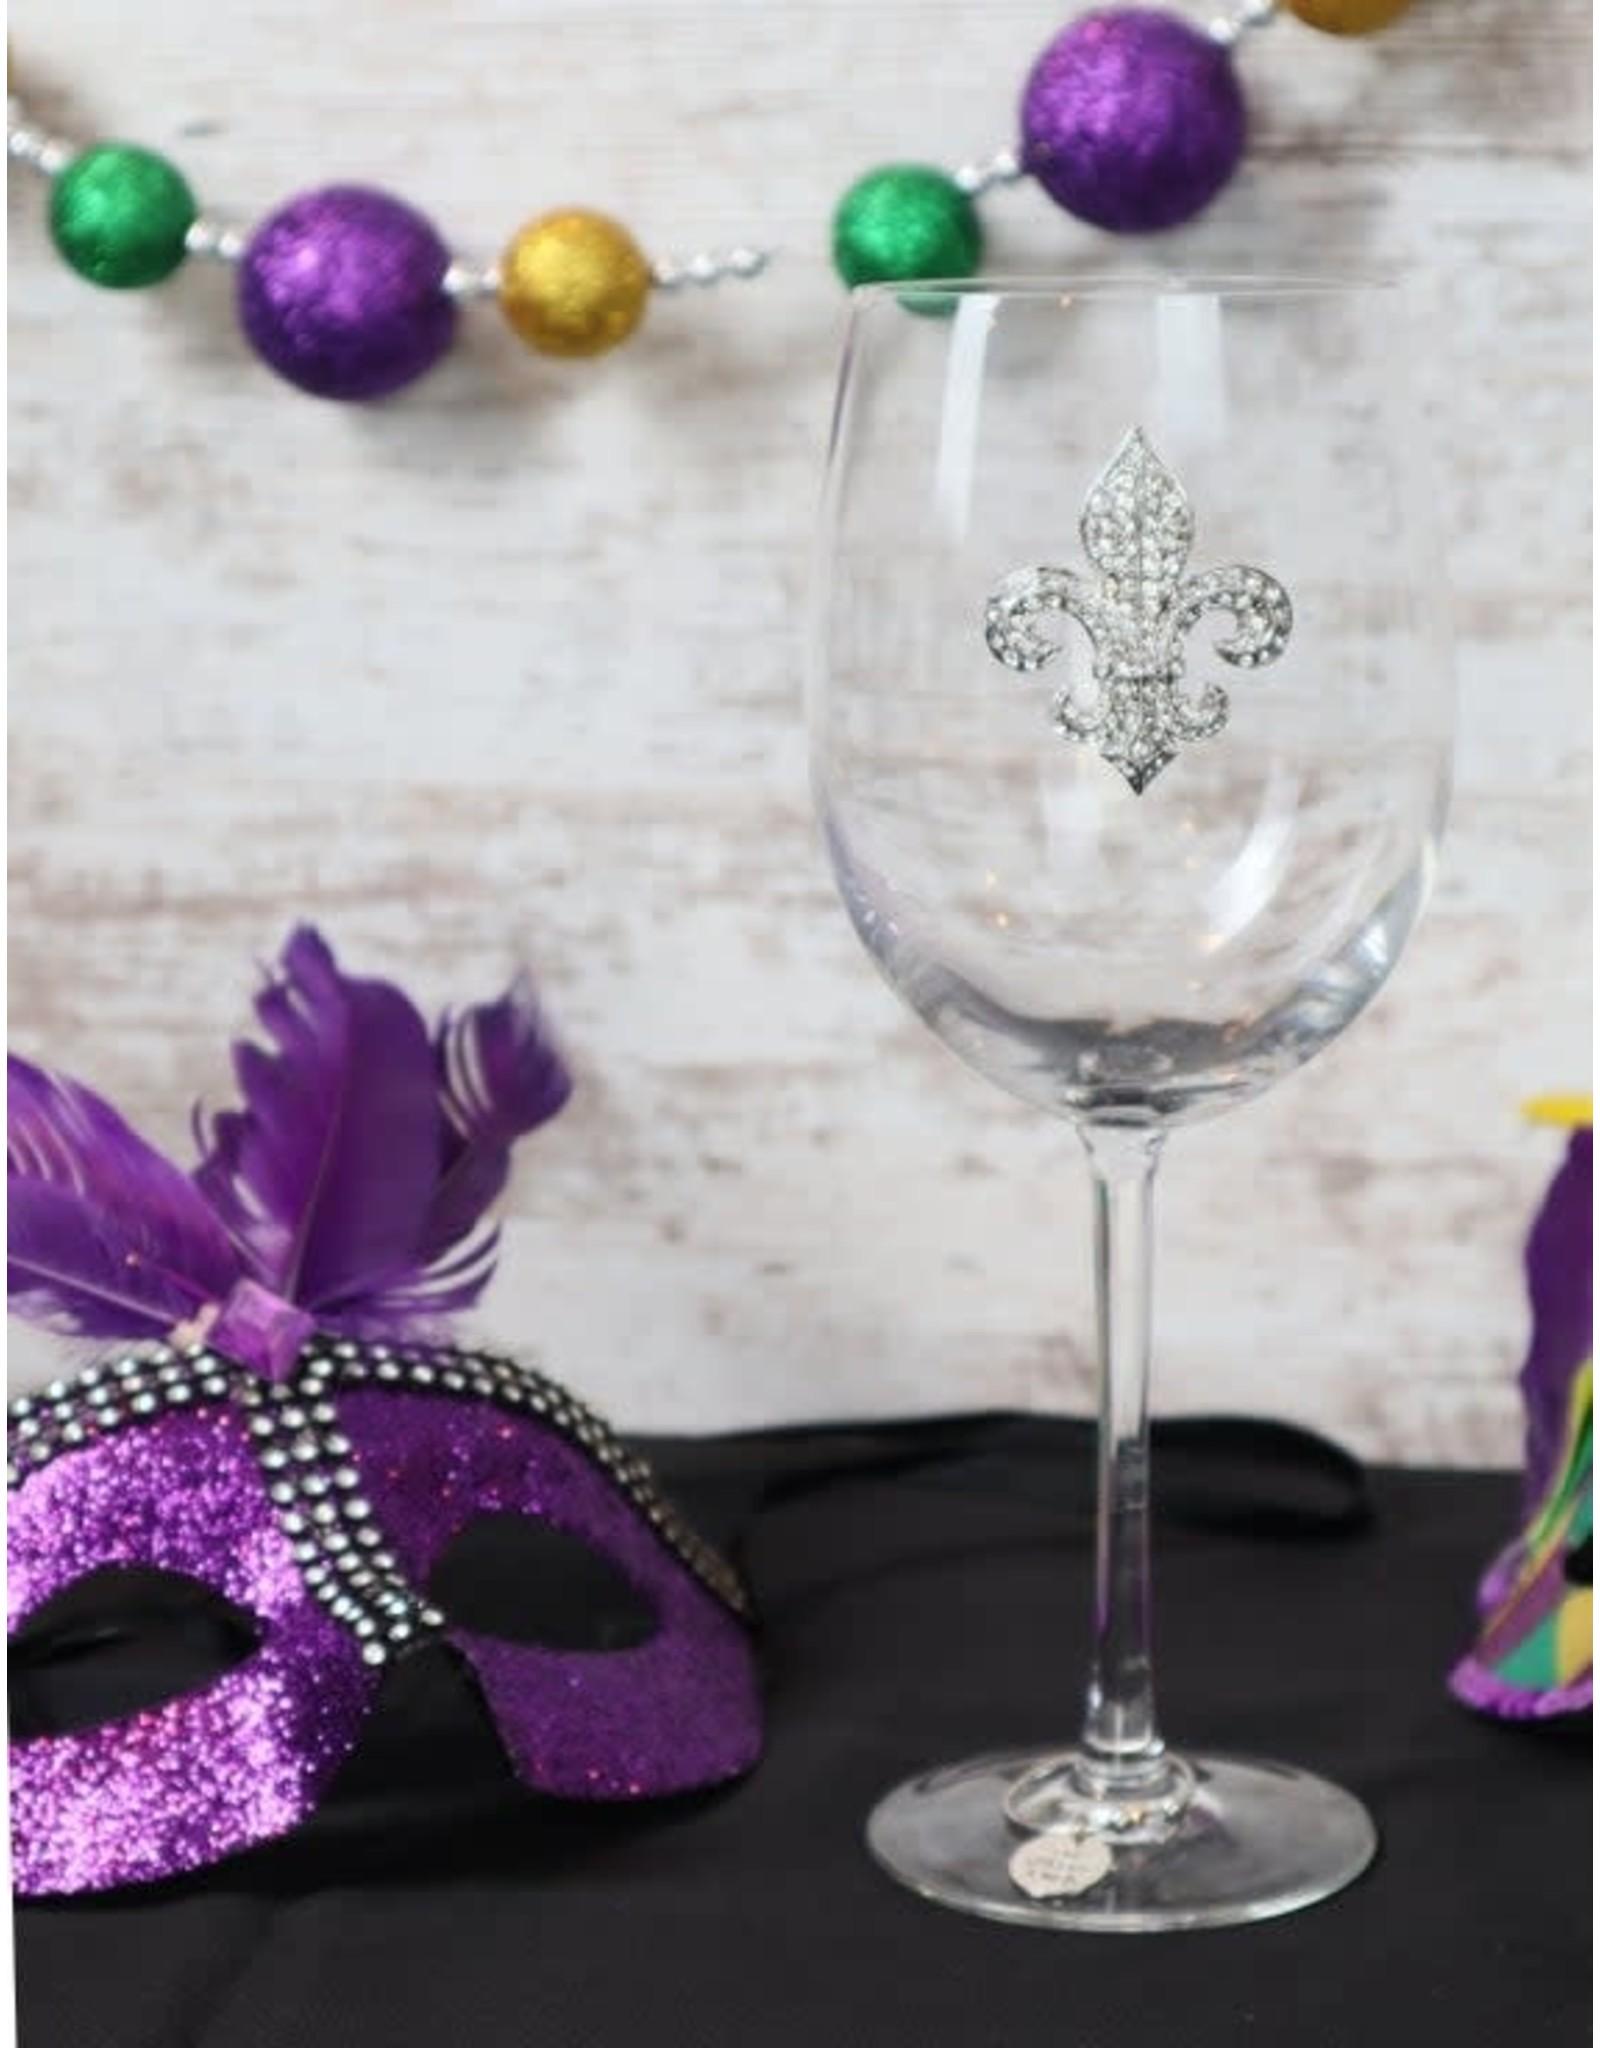 The Queen's Jewels Diamond FDL Jeweled Stemmed Wine Glass